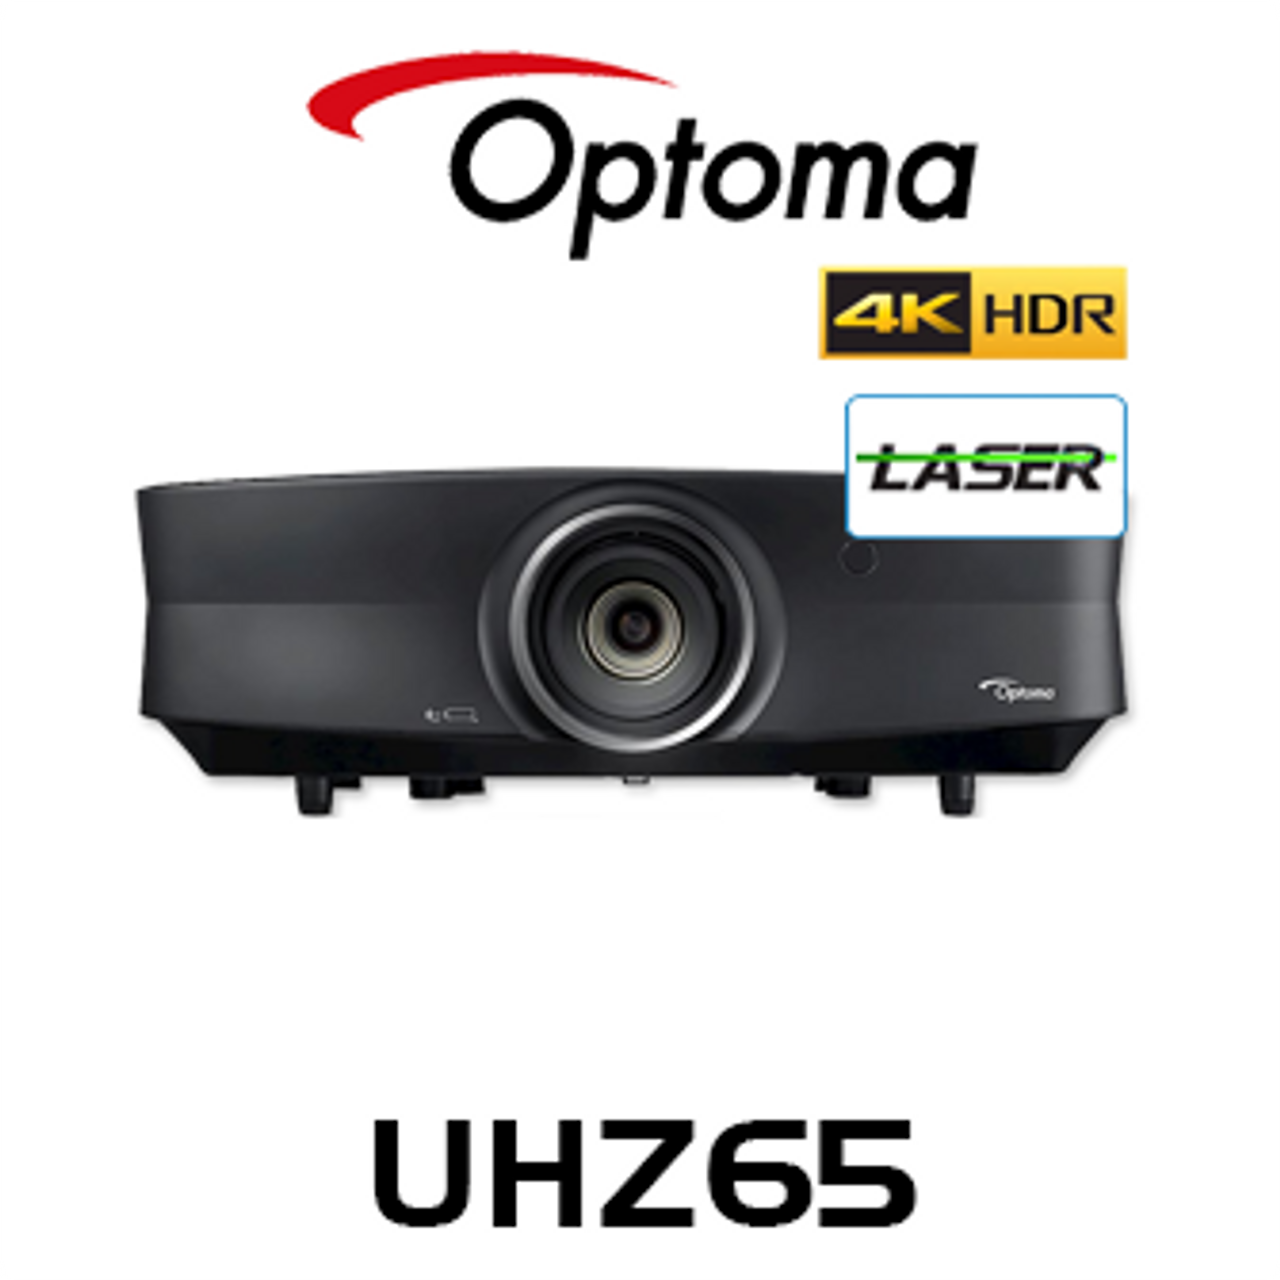 Optoma UHZ65 4K UHD 3000 Lumen IP5X HDR Laser DLP Projector